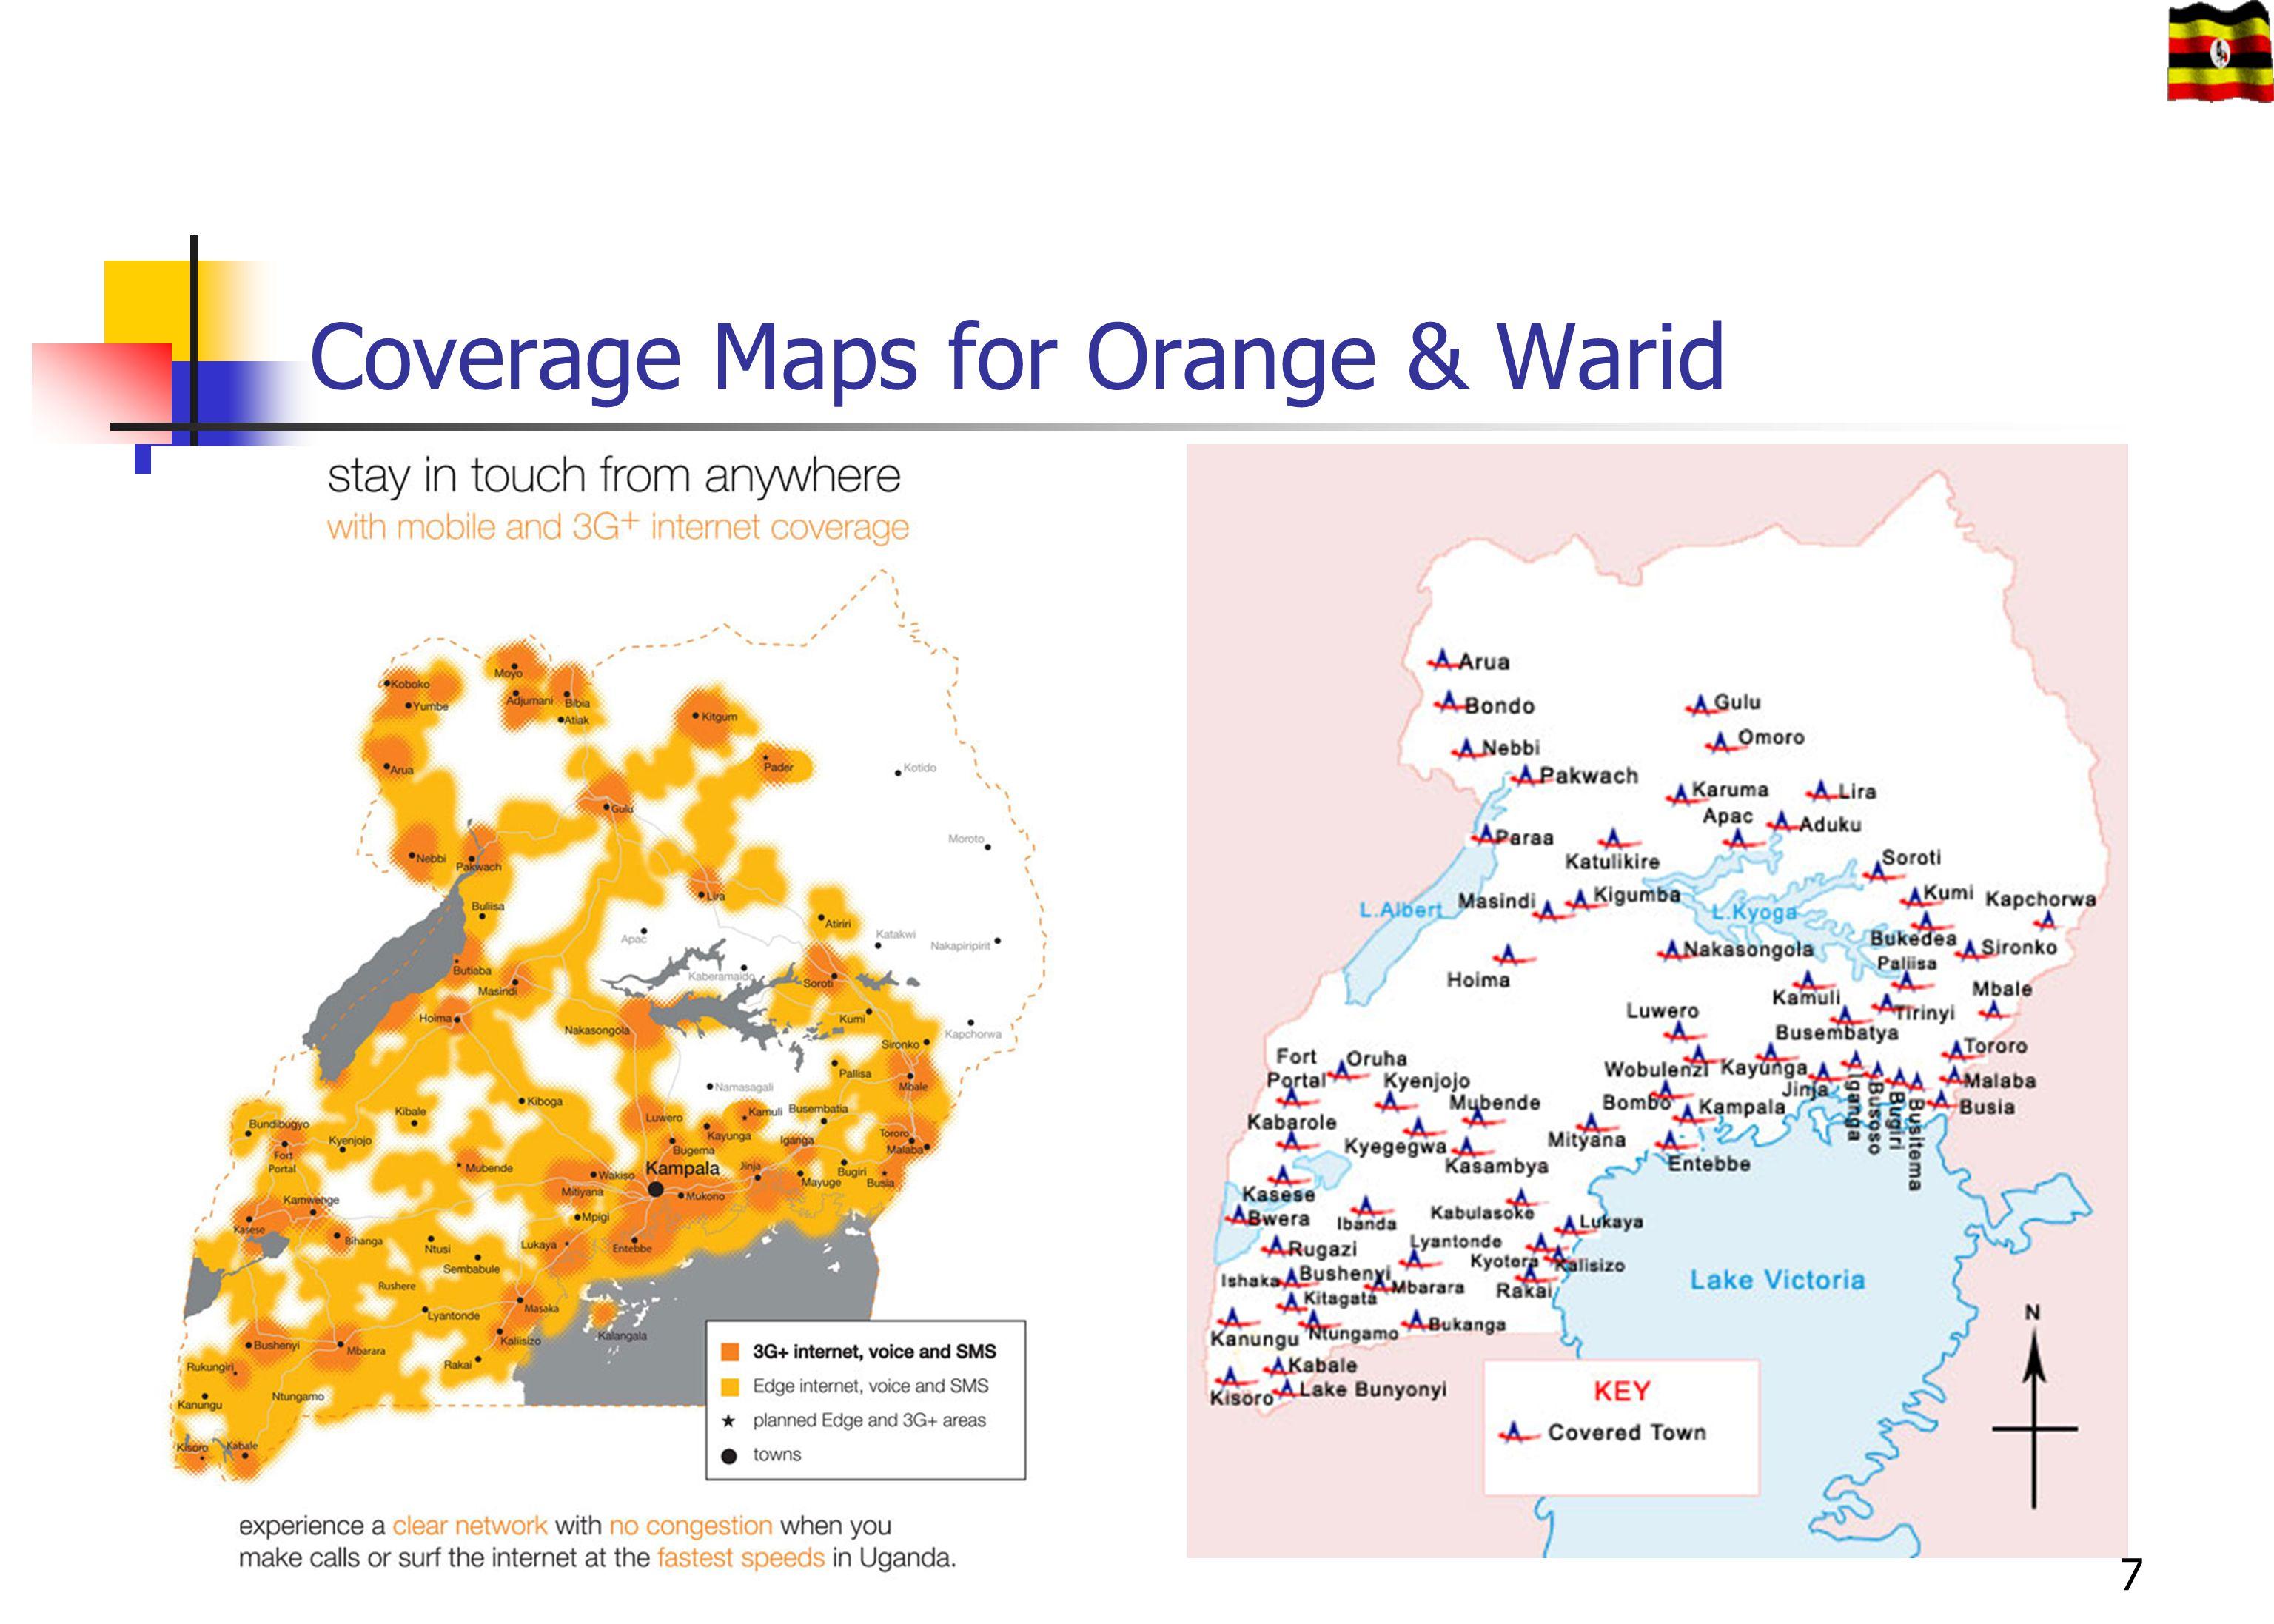 Coverage Maps for Orange & Warid 7